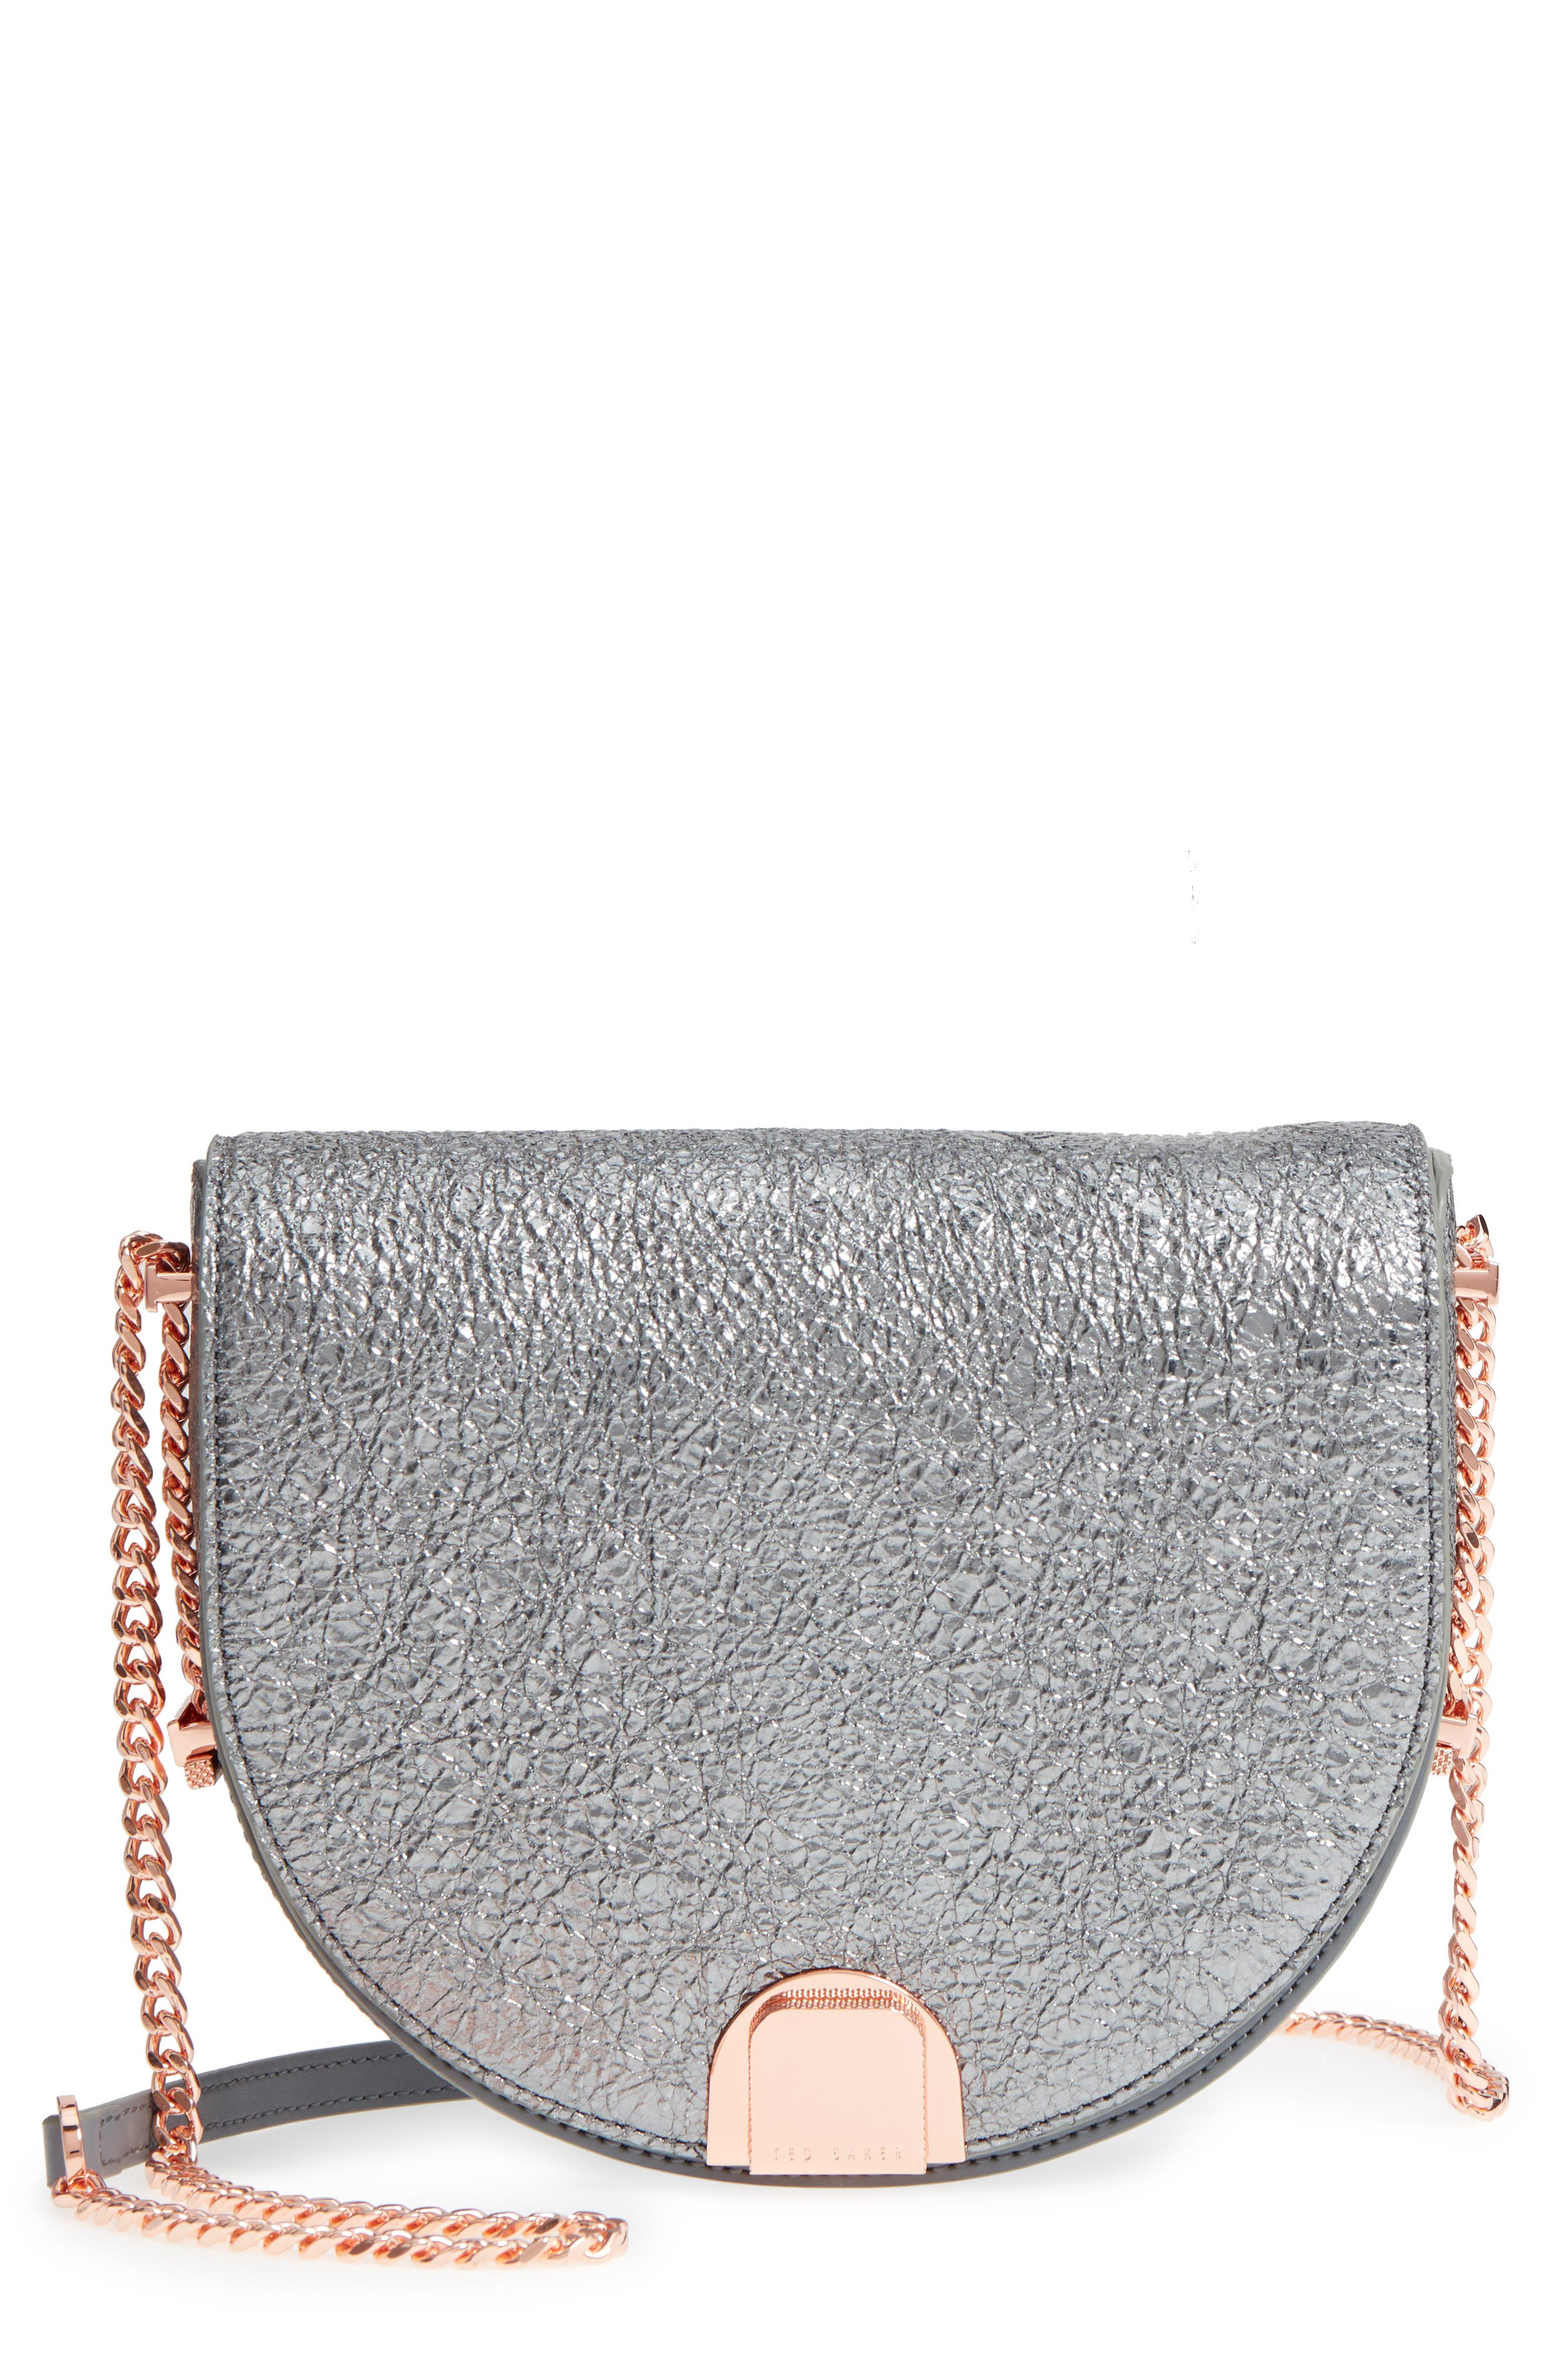 Half Moon Metallic Leather Crossbody Bag,                         Main,                         color, Gunmetal